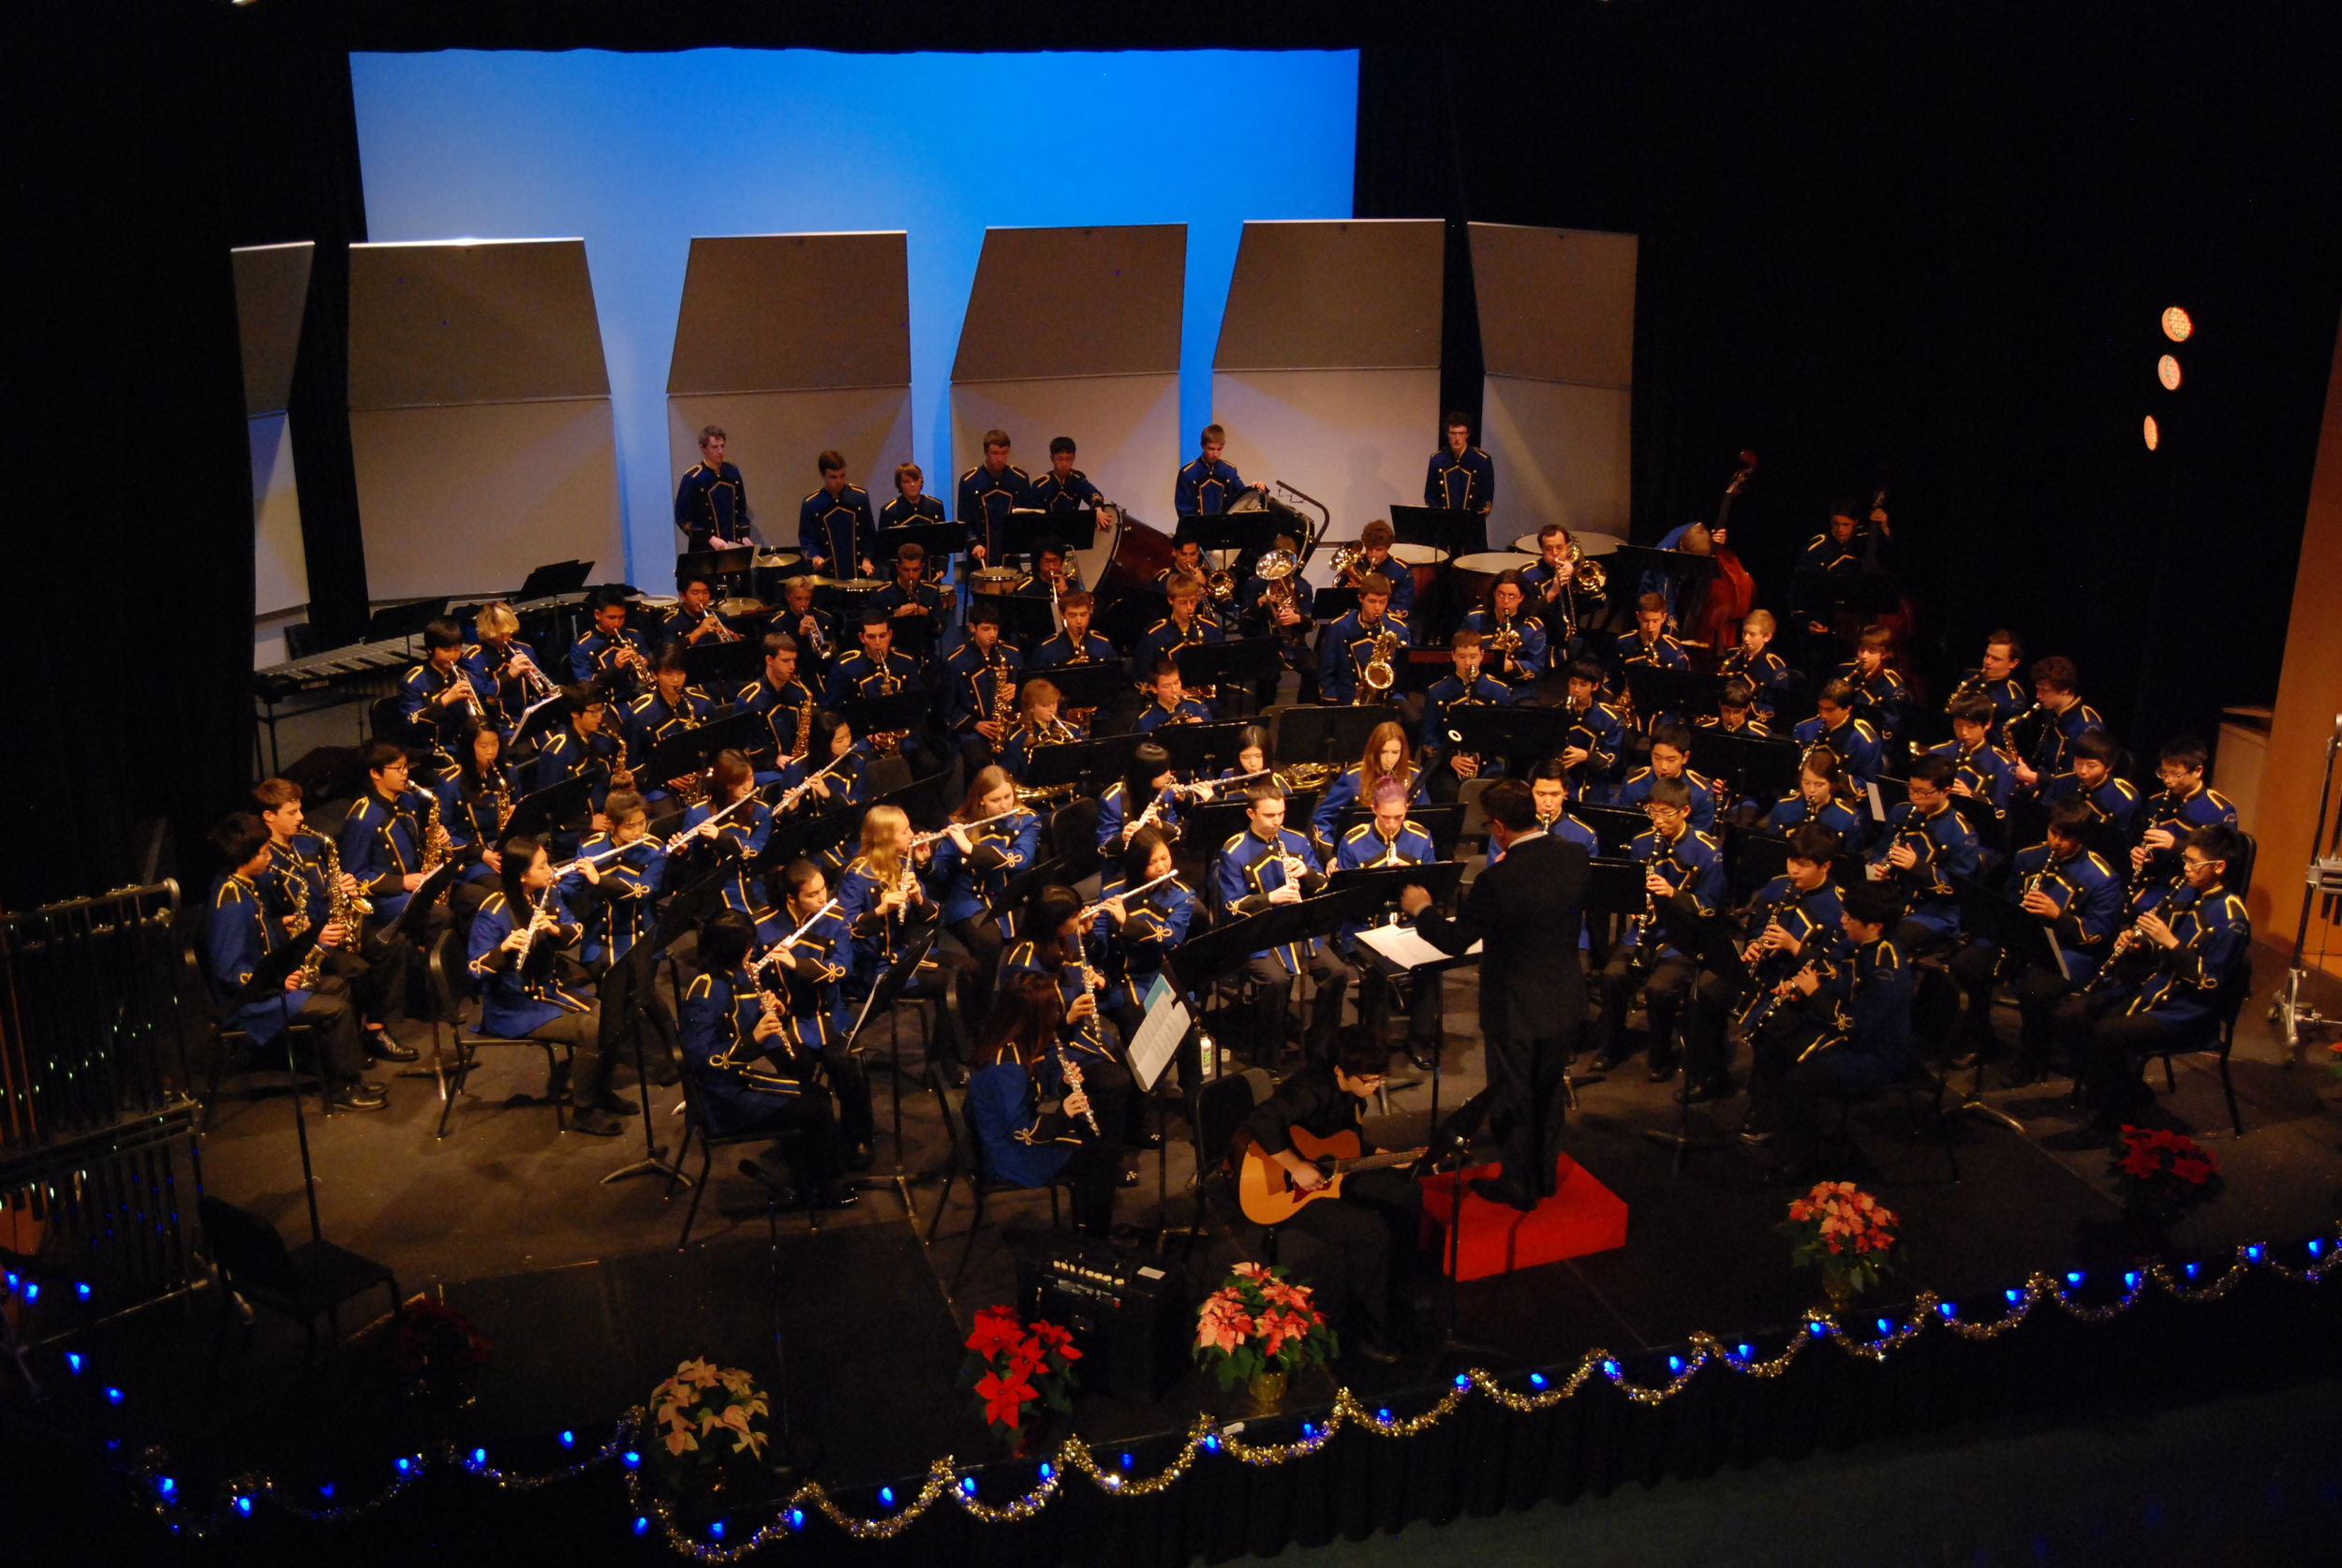 Playing Timpani at Christmas concert (top left)